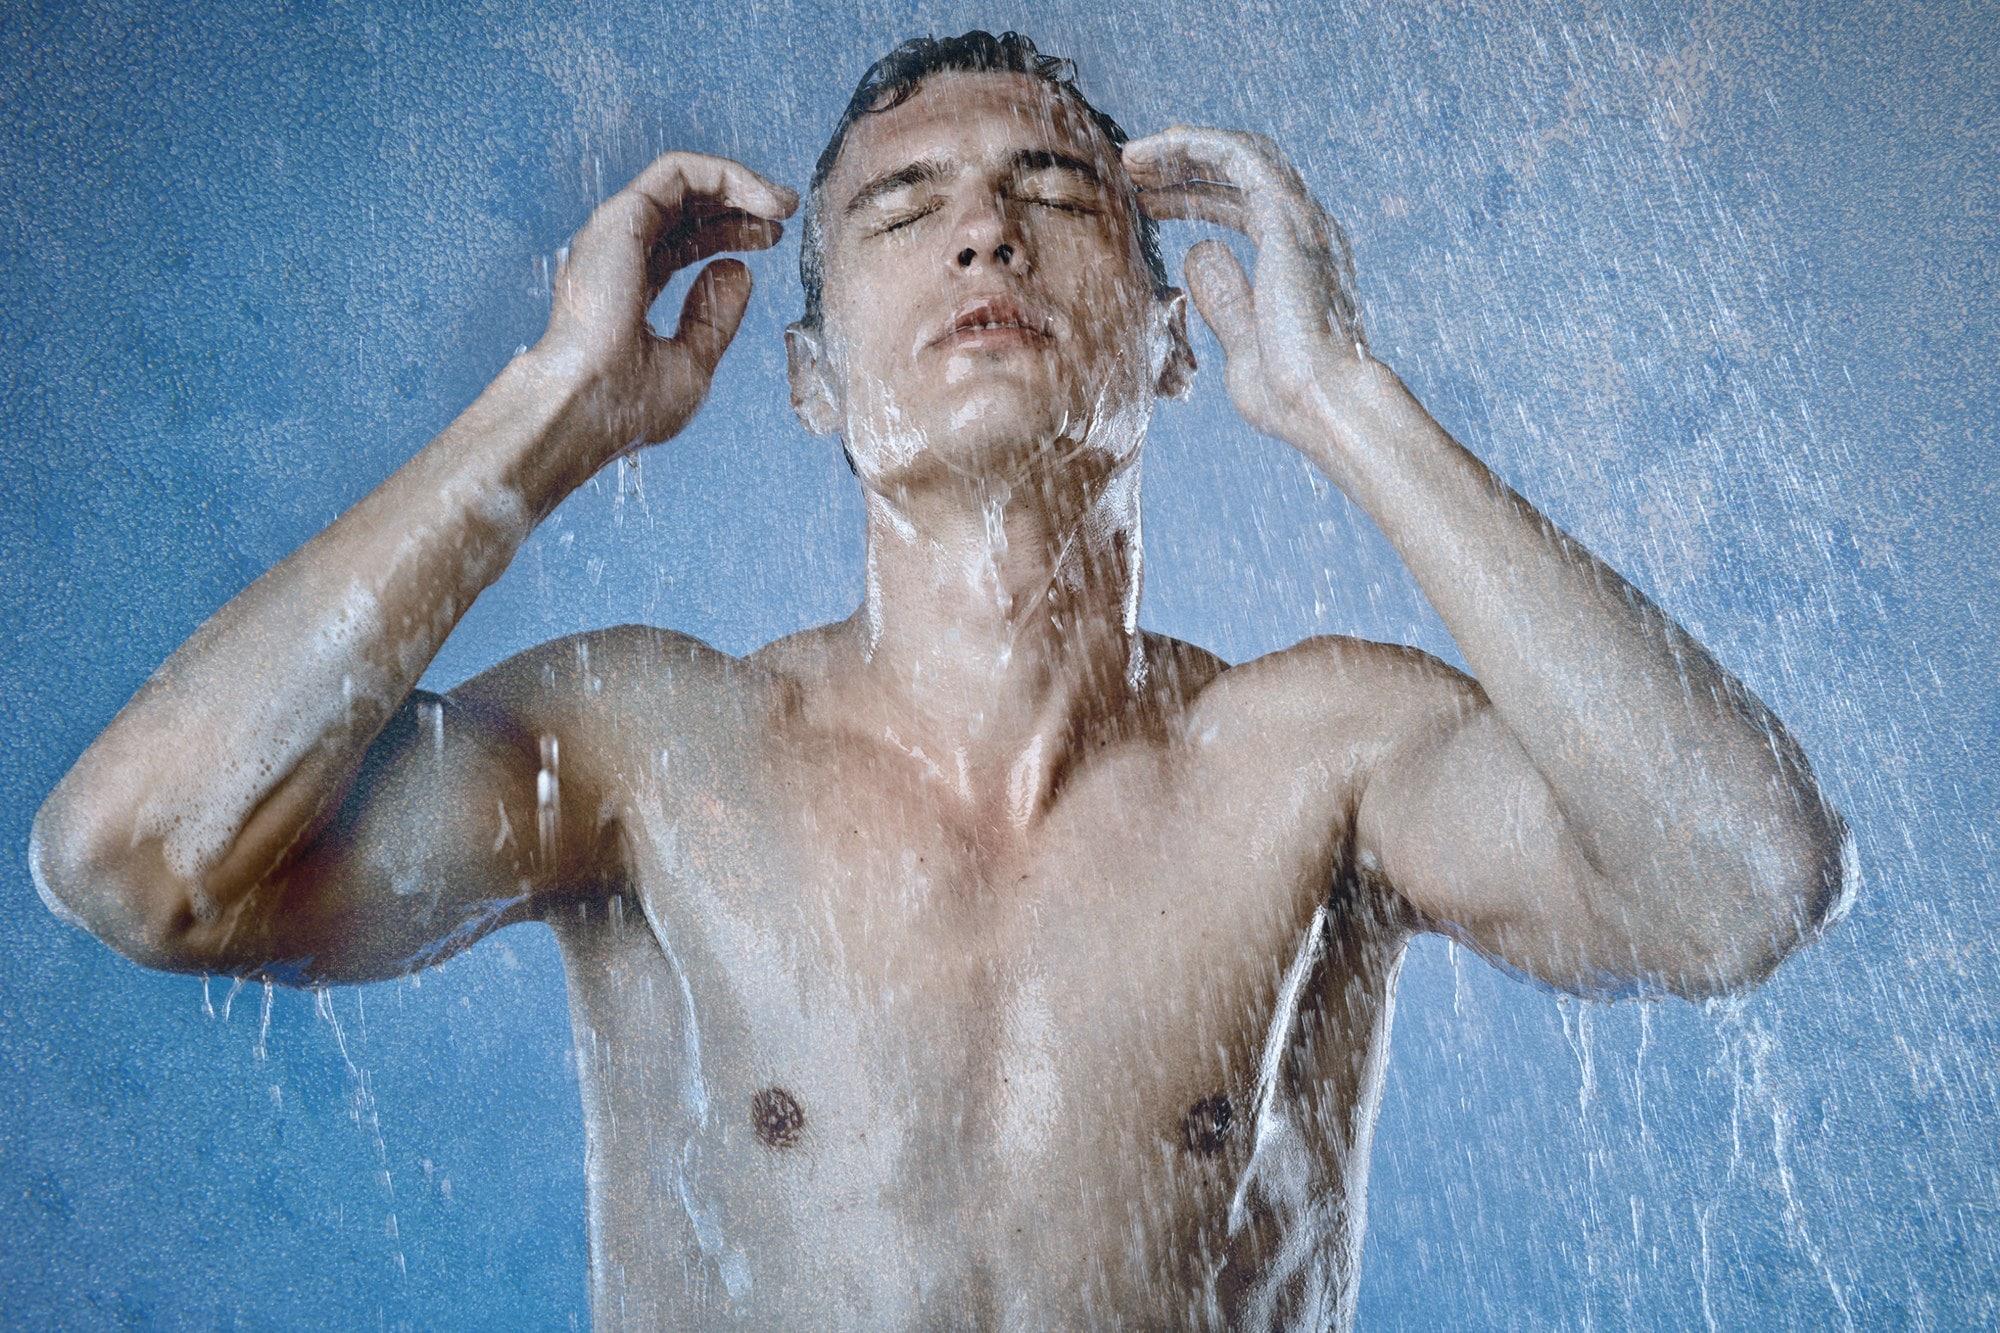 теплый душ в жару